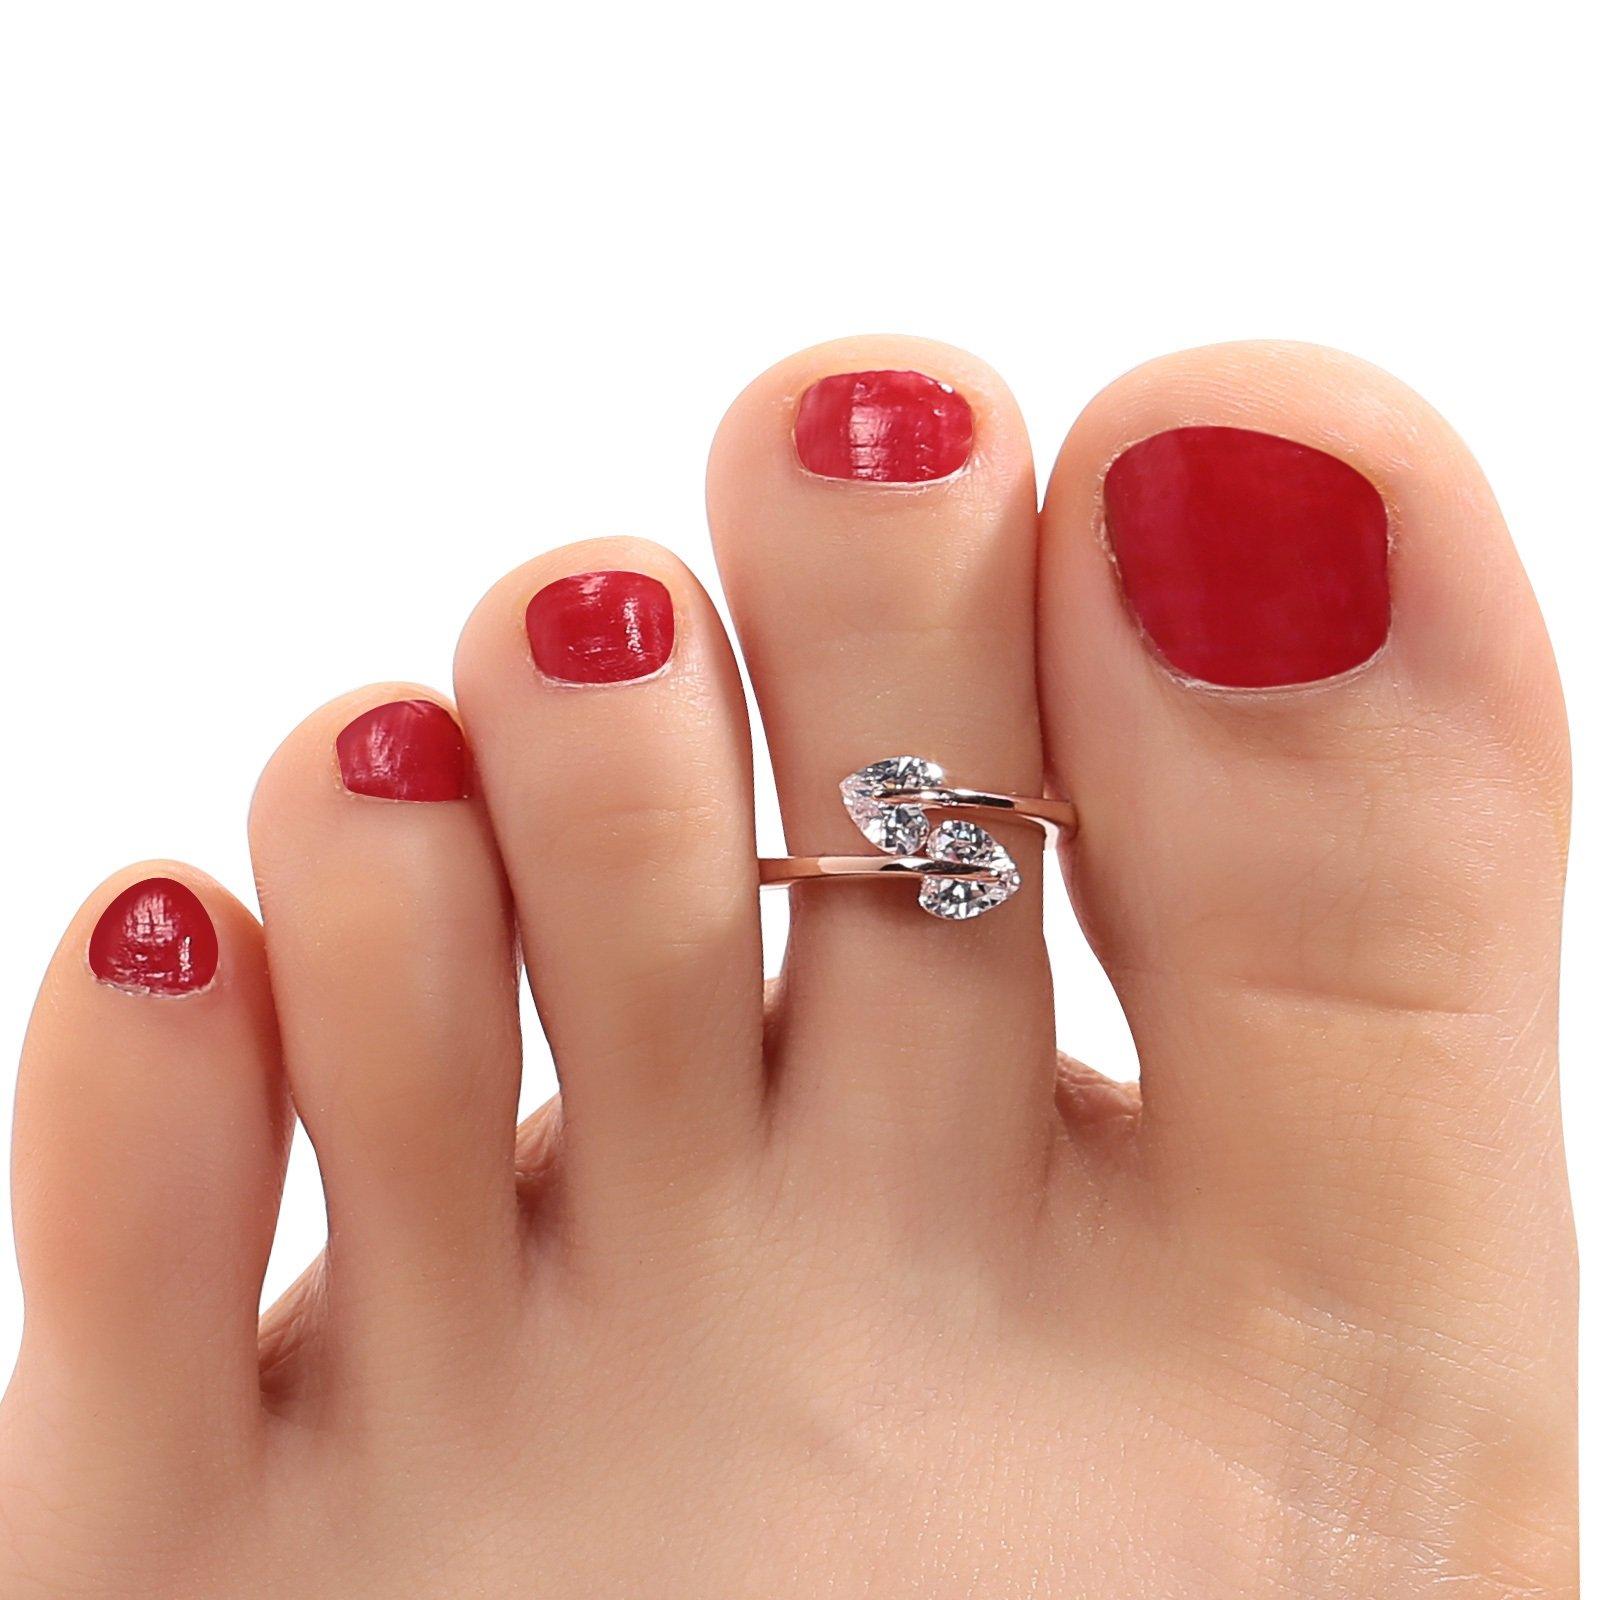 Aokarry 925 Sterling Silver Toe Rings For Women Girls Heart Cubic Zirconia Bypass Open Rose Gold